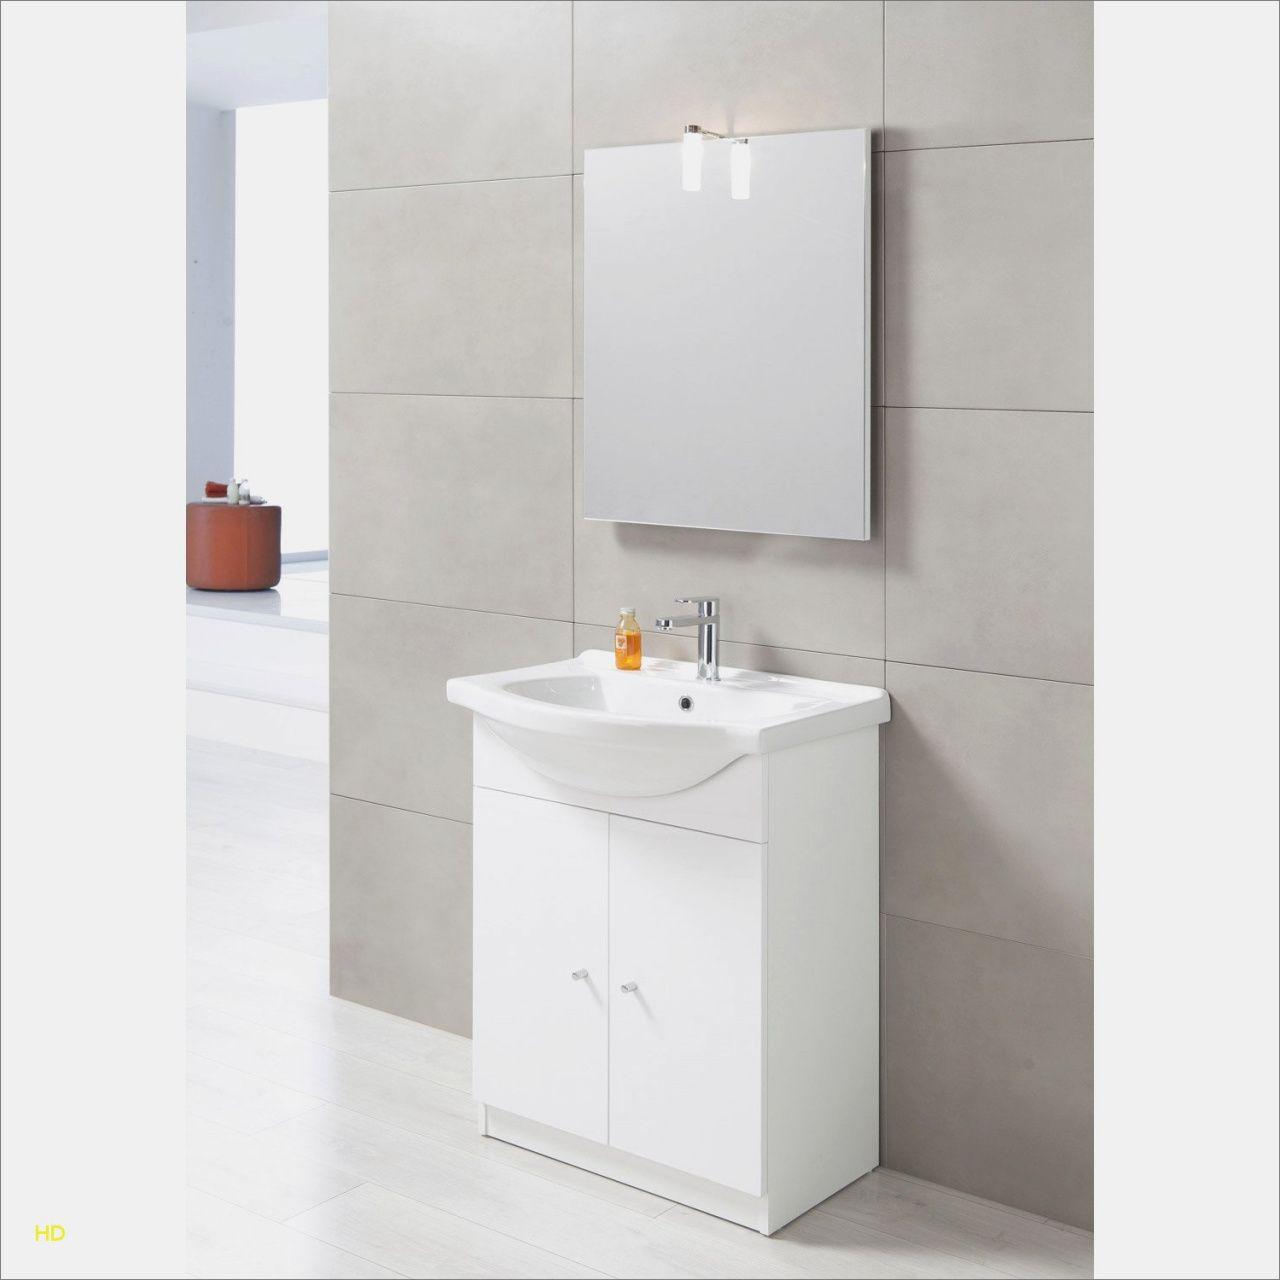 Meuble Salle De Bain Design Contemporain meuble miroir design - kumpalo.parkersydnorhistoric